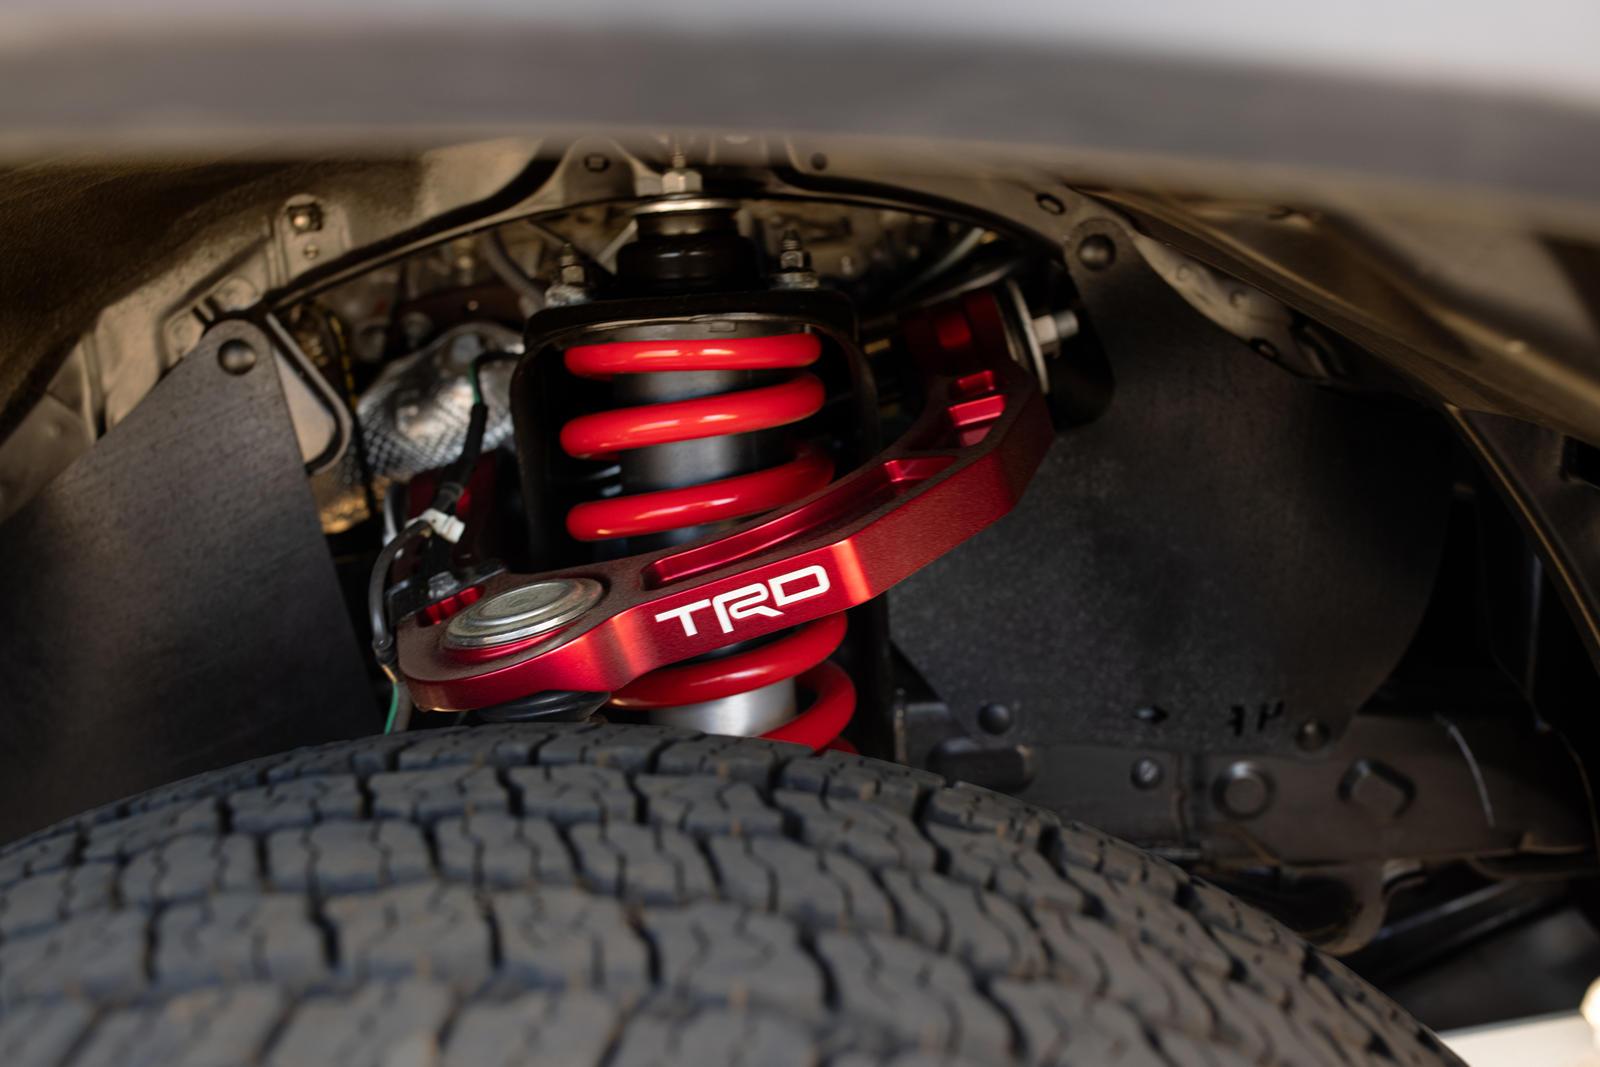 Toyota-ra-mắt-Tacoma-TRD-Pro-2022 (4).jpg